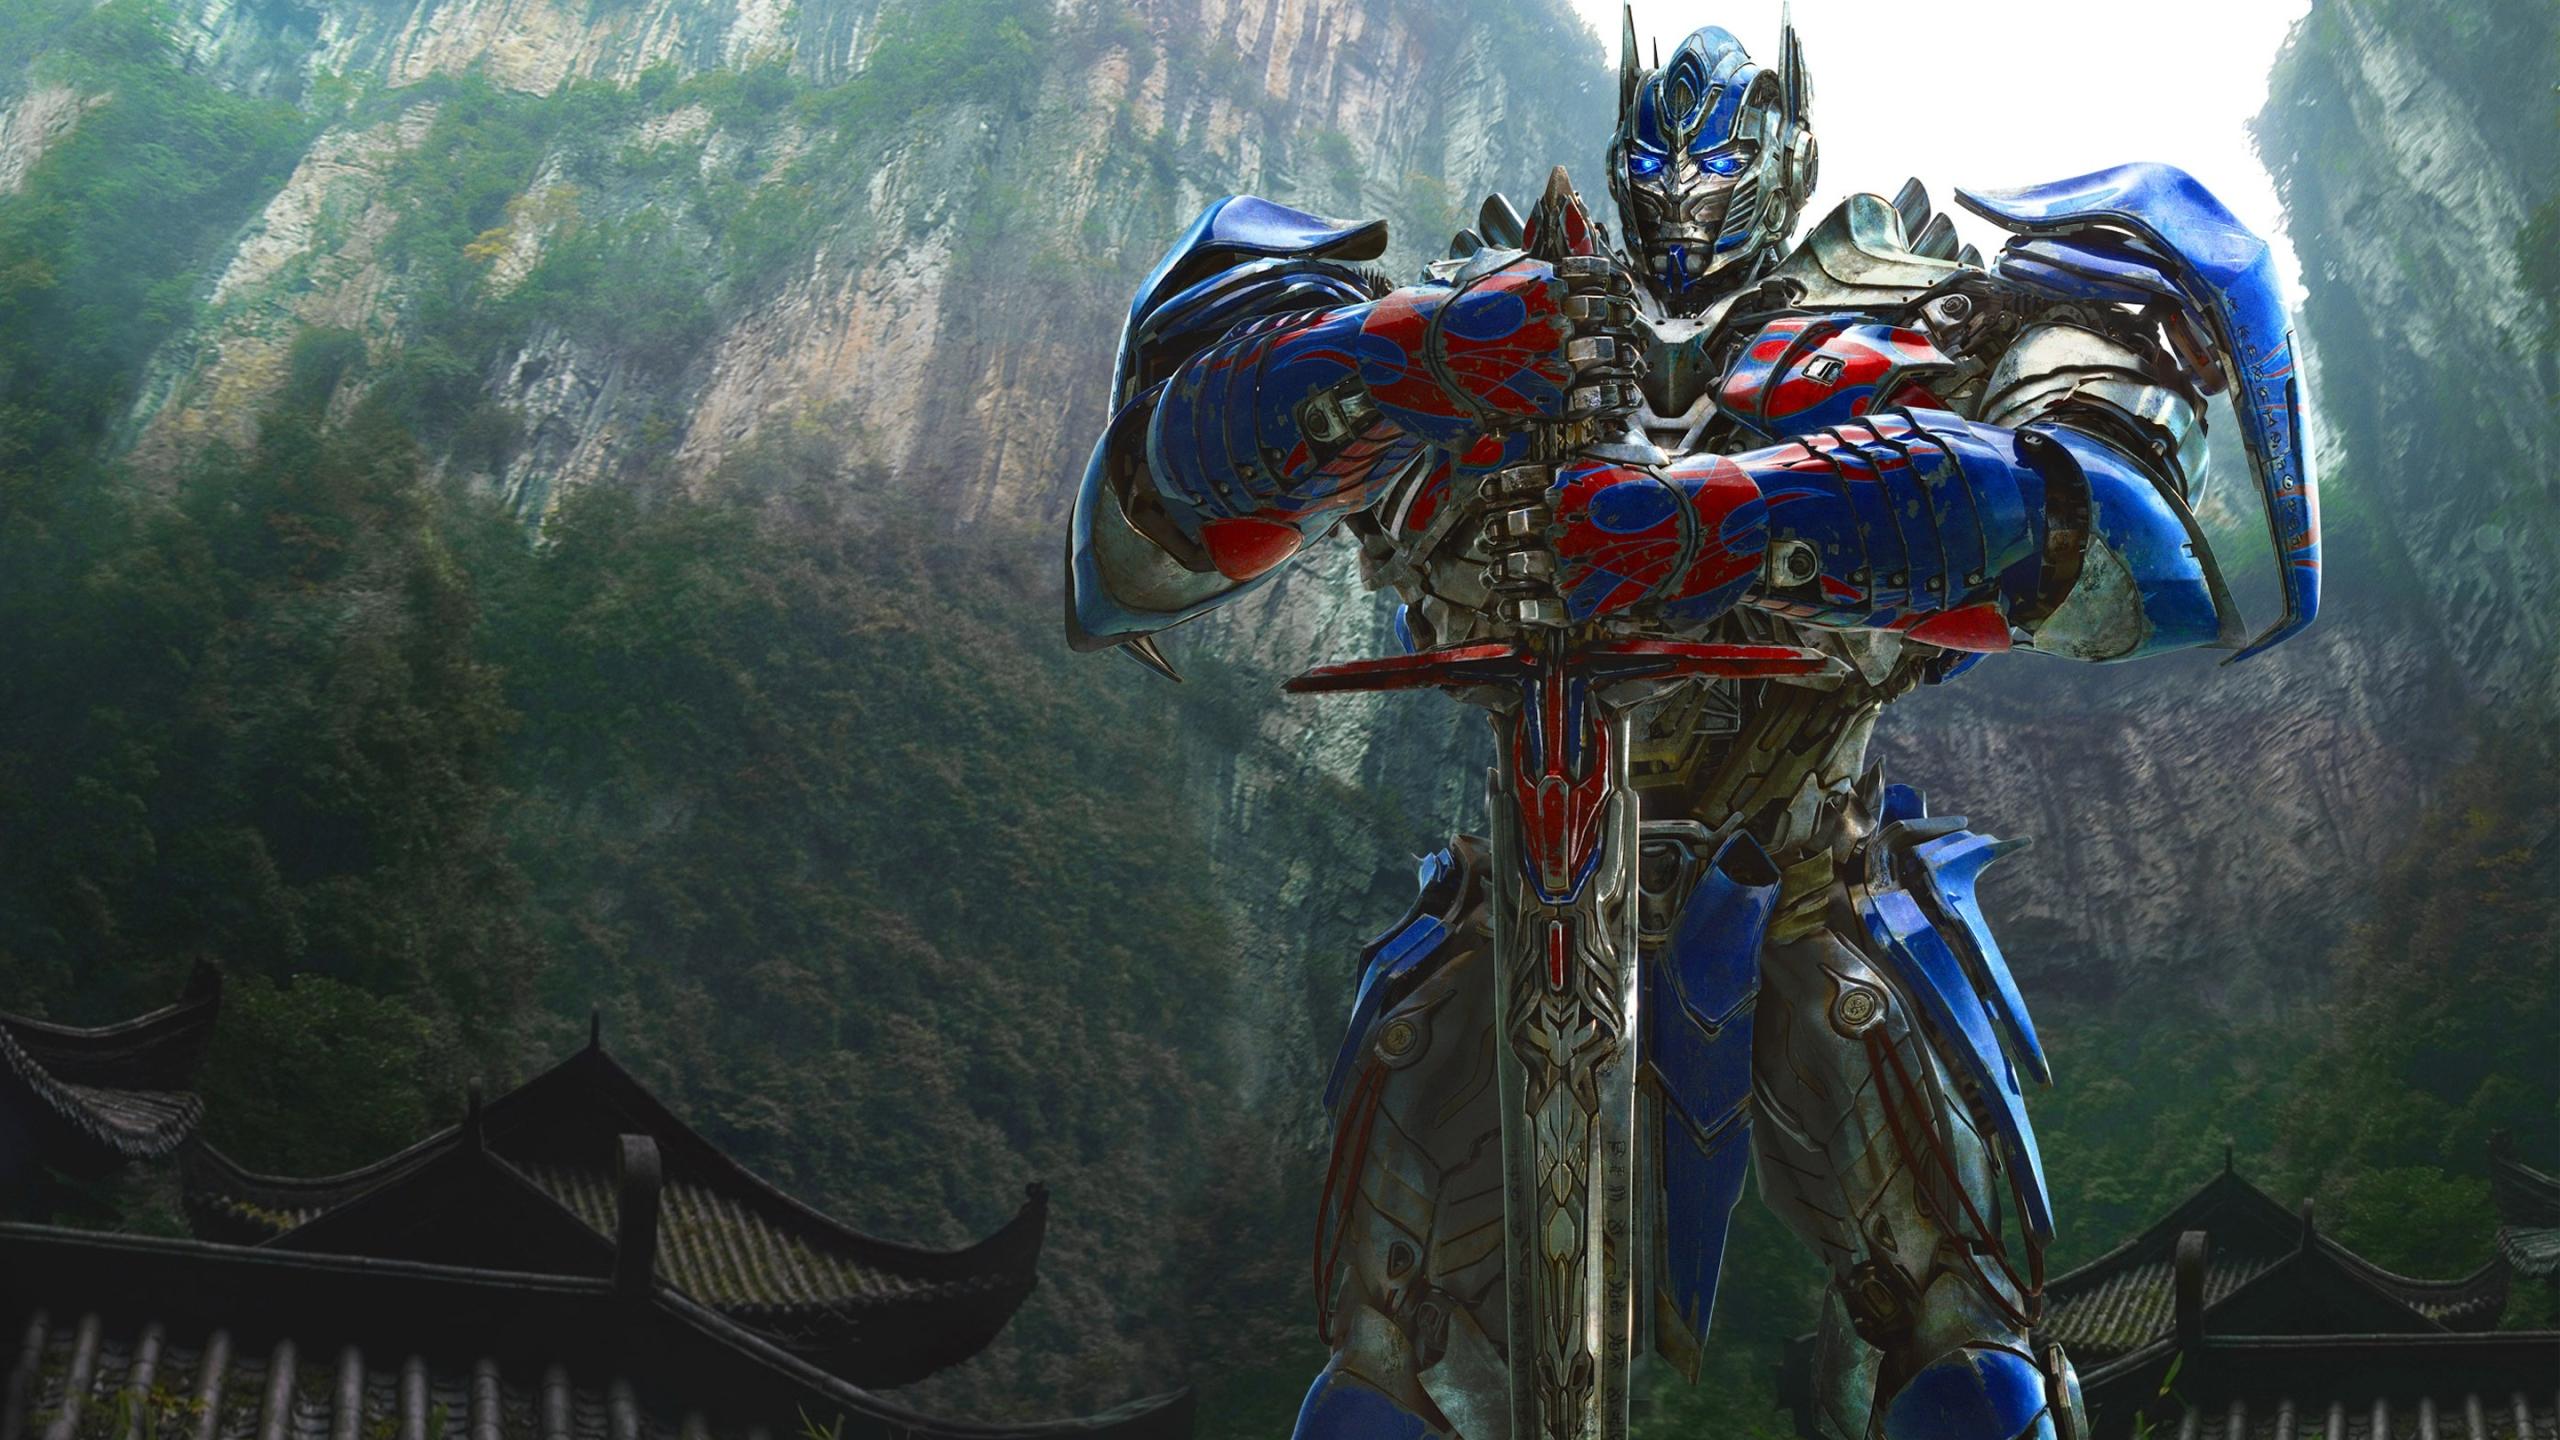 2560x1440 Optimus Prime In Transformers 1440p Resolution Wallpaper